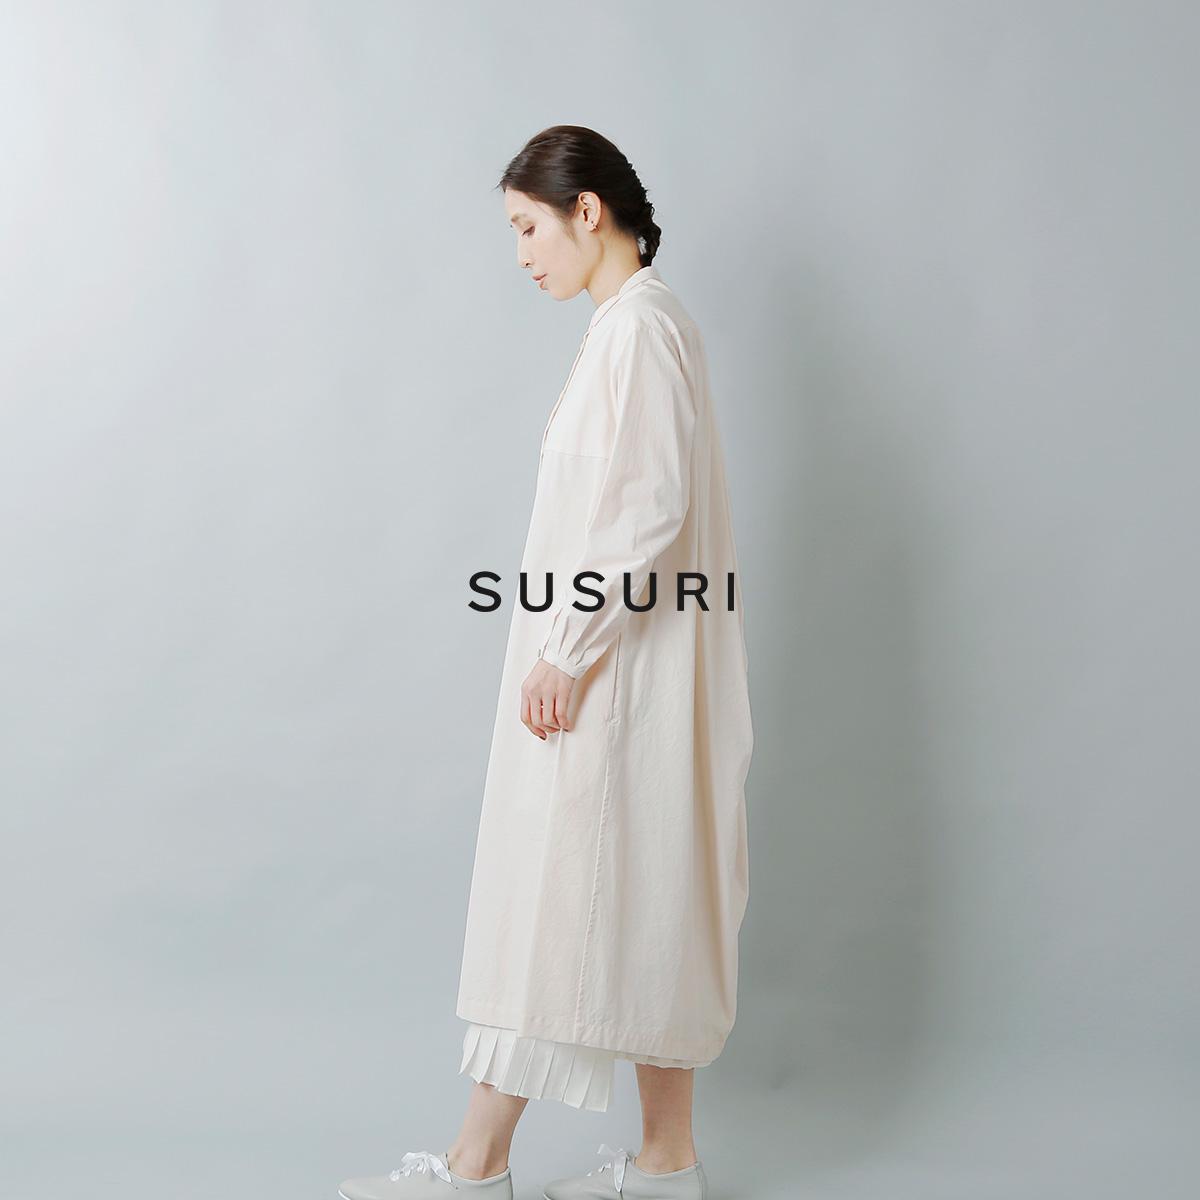 susuri(ススリ)コットンヘムレンシャツワンピース 20-207